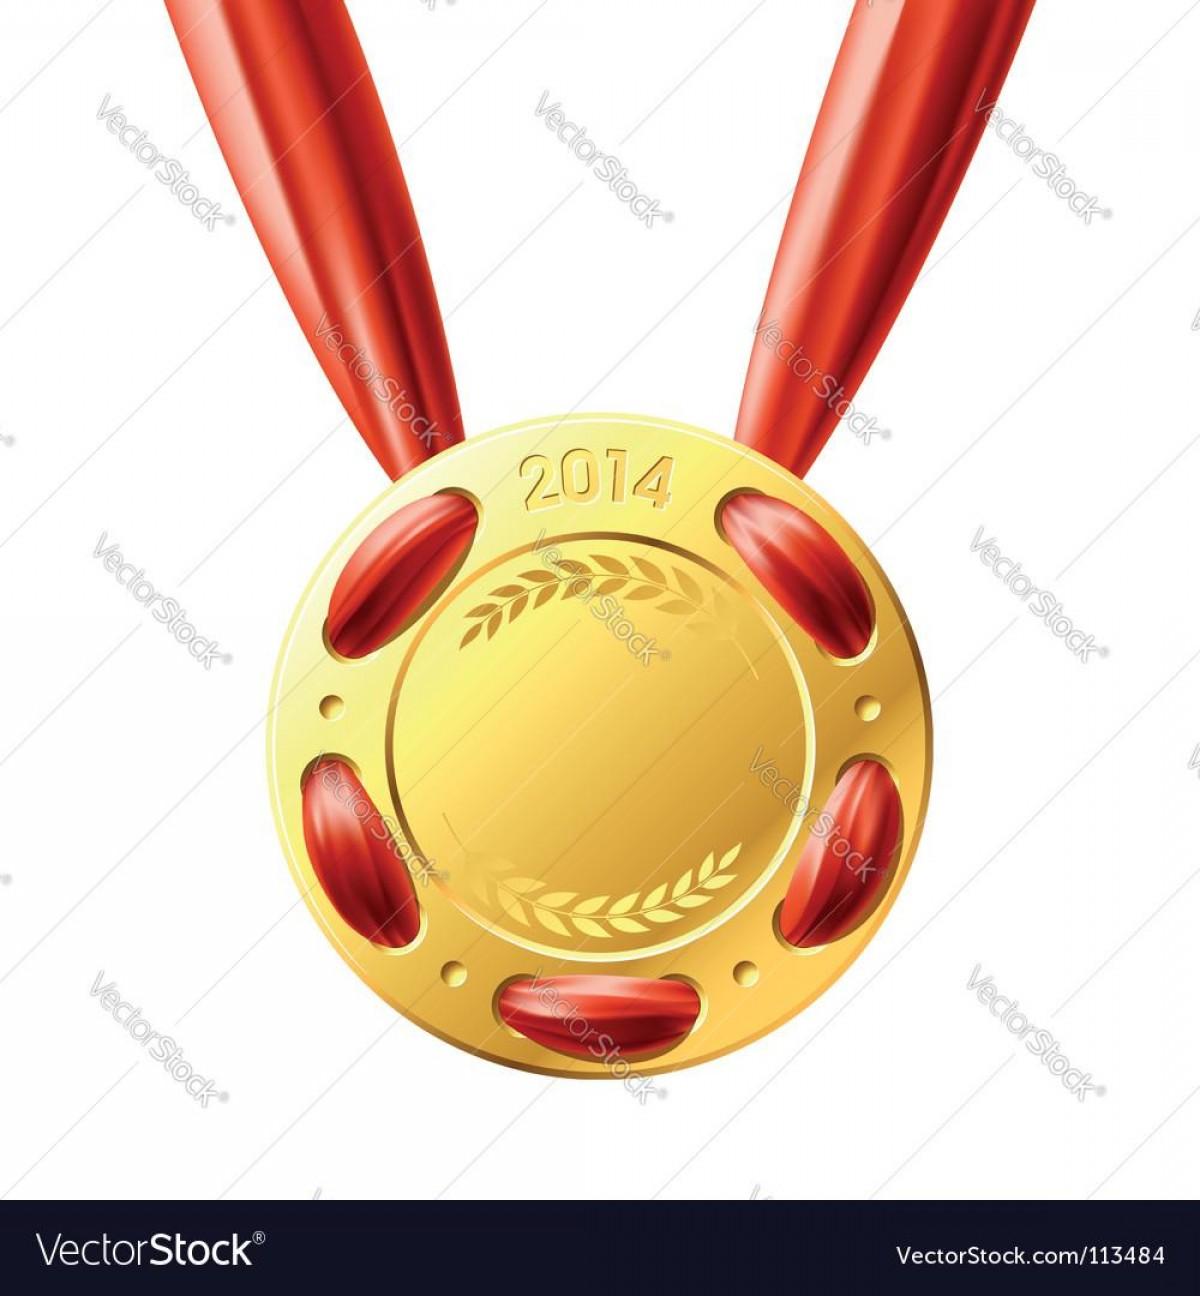 1200x1296 Best Gold Medal Vector Photos Shopatcloth